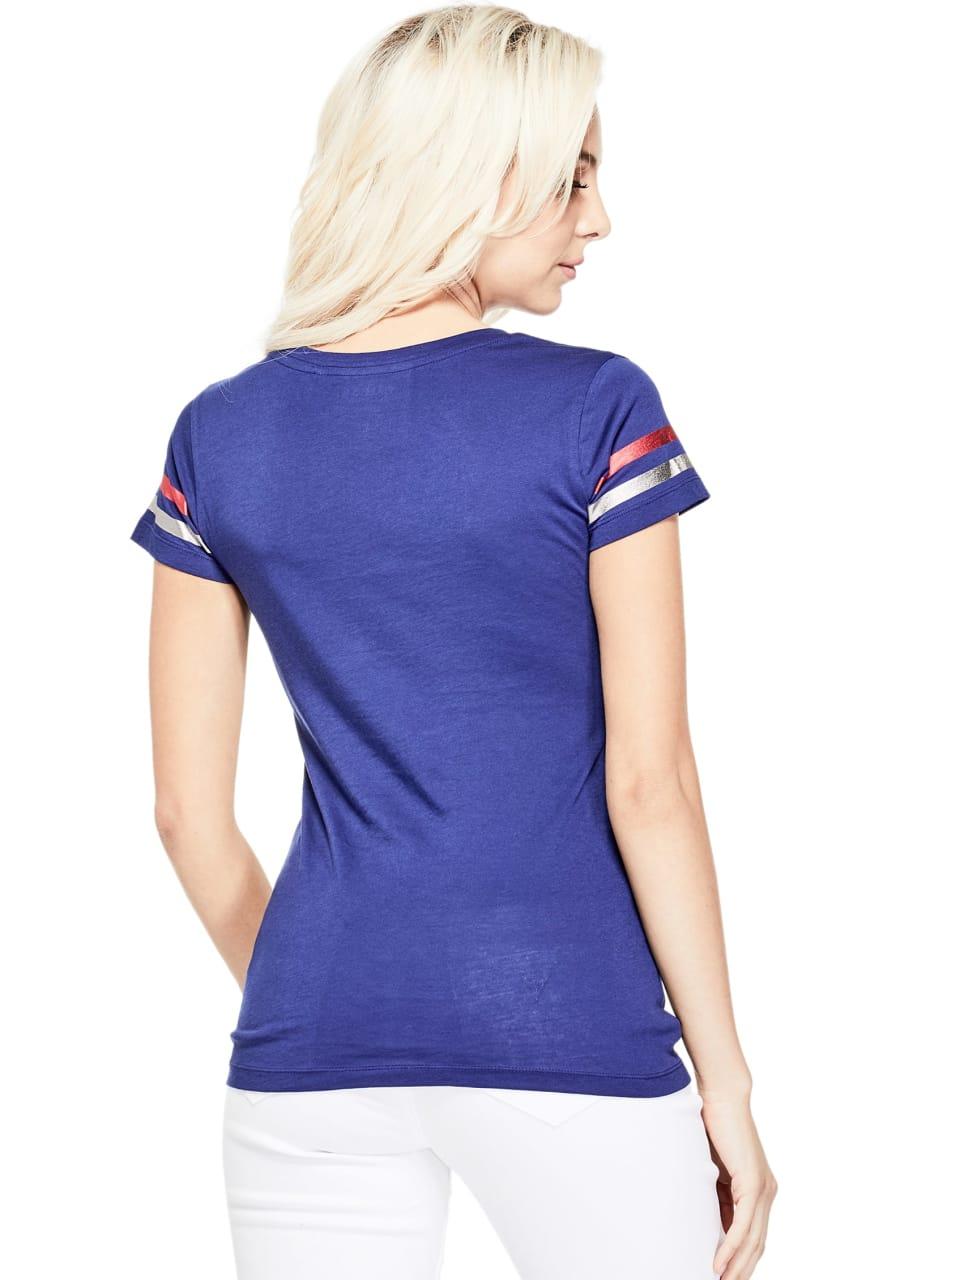 GUESS-Factory-Women-039-s-Texas-City-V-Neck-Varsity-Short-Sleeve-Tee thumbnail 12